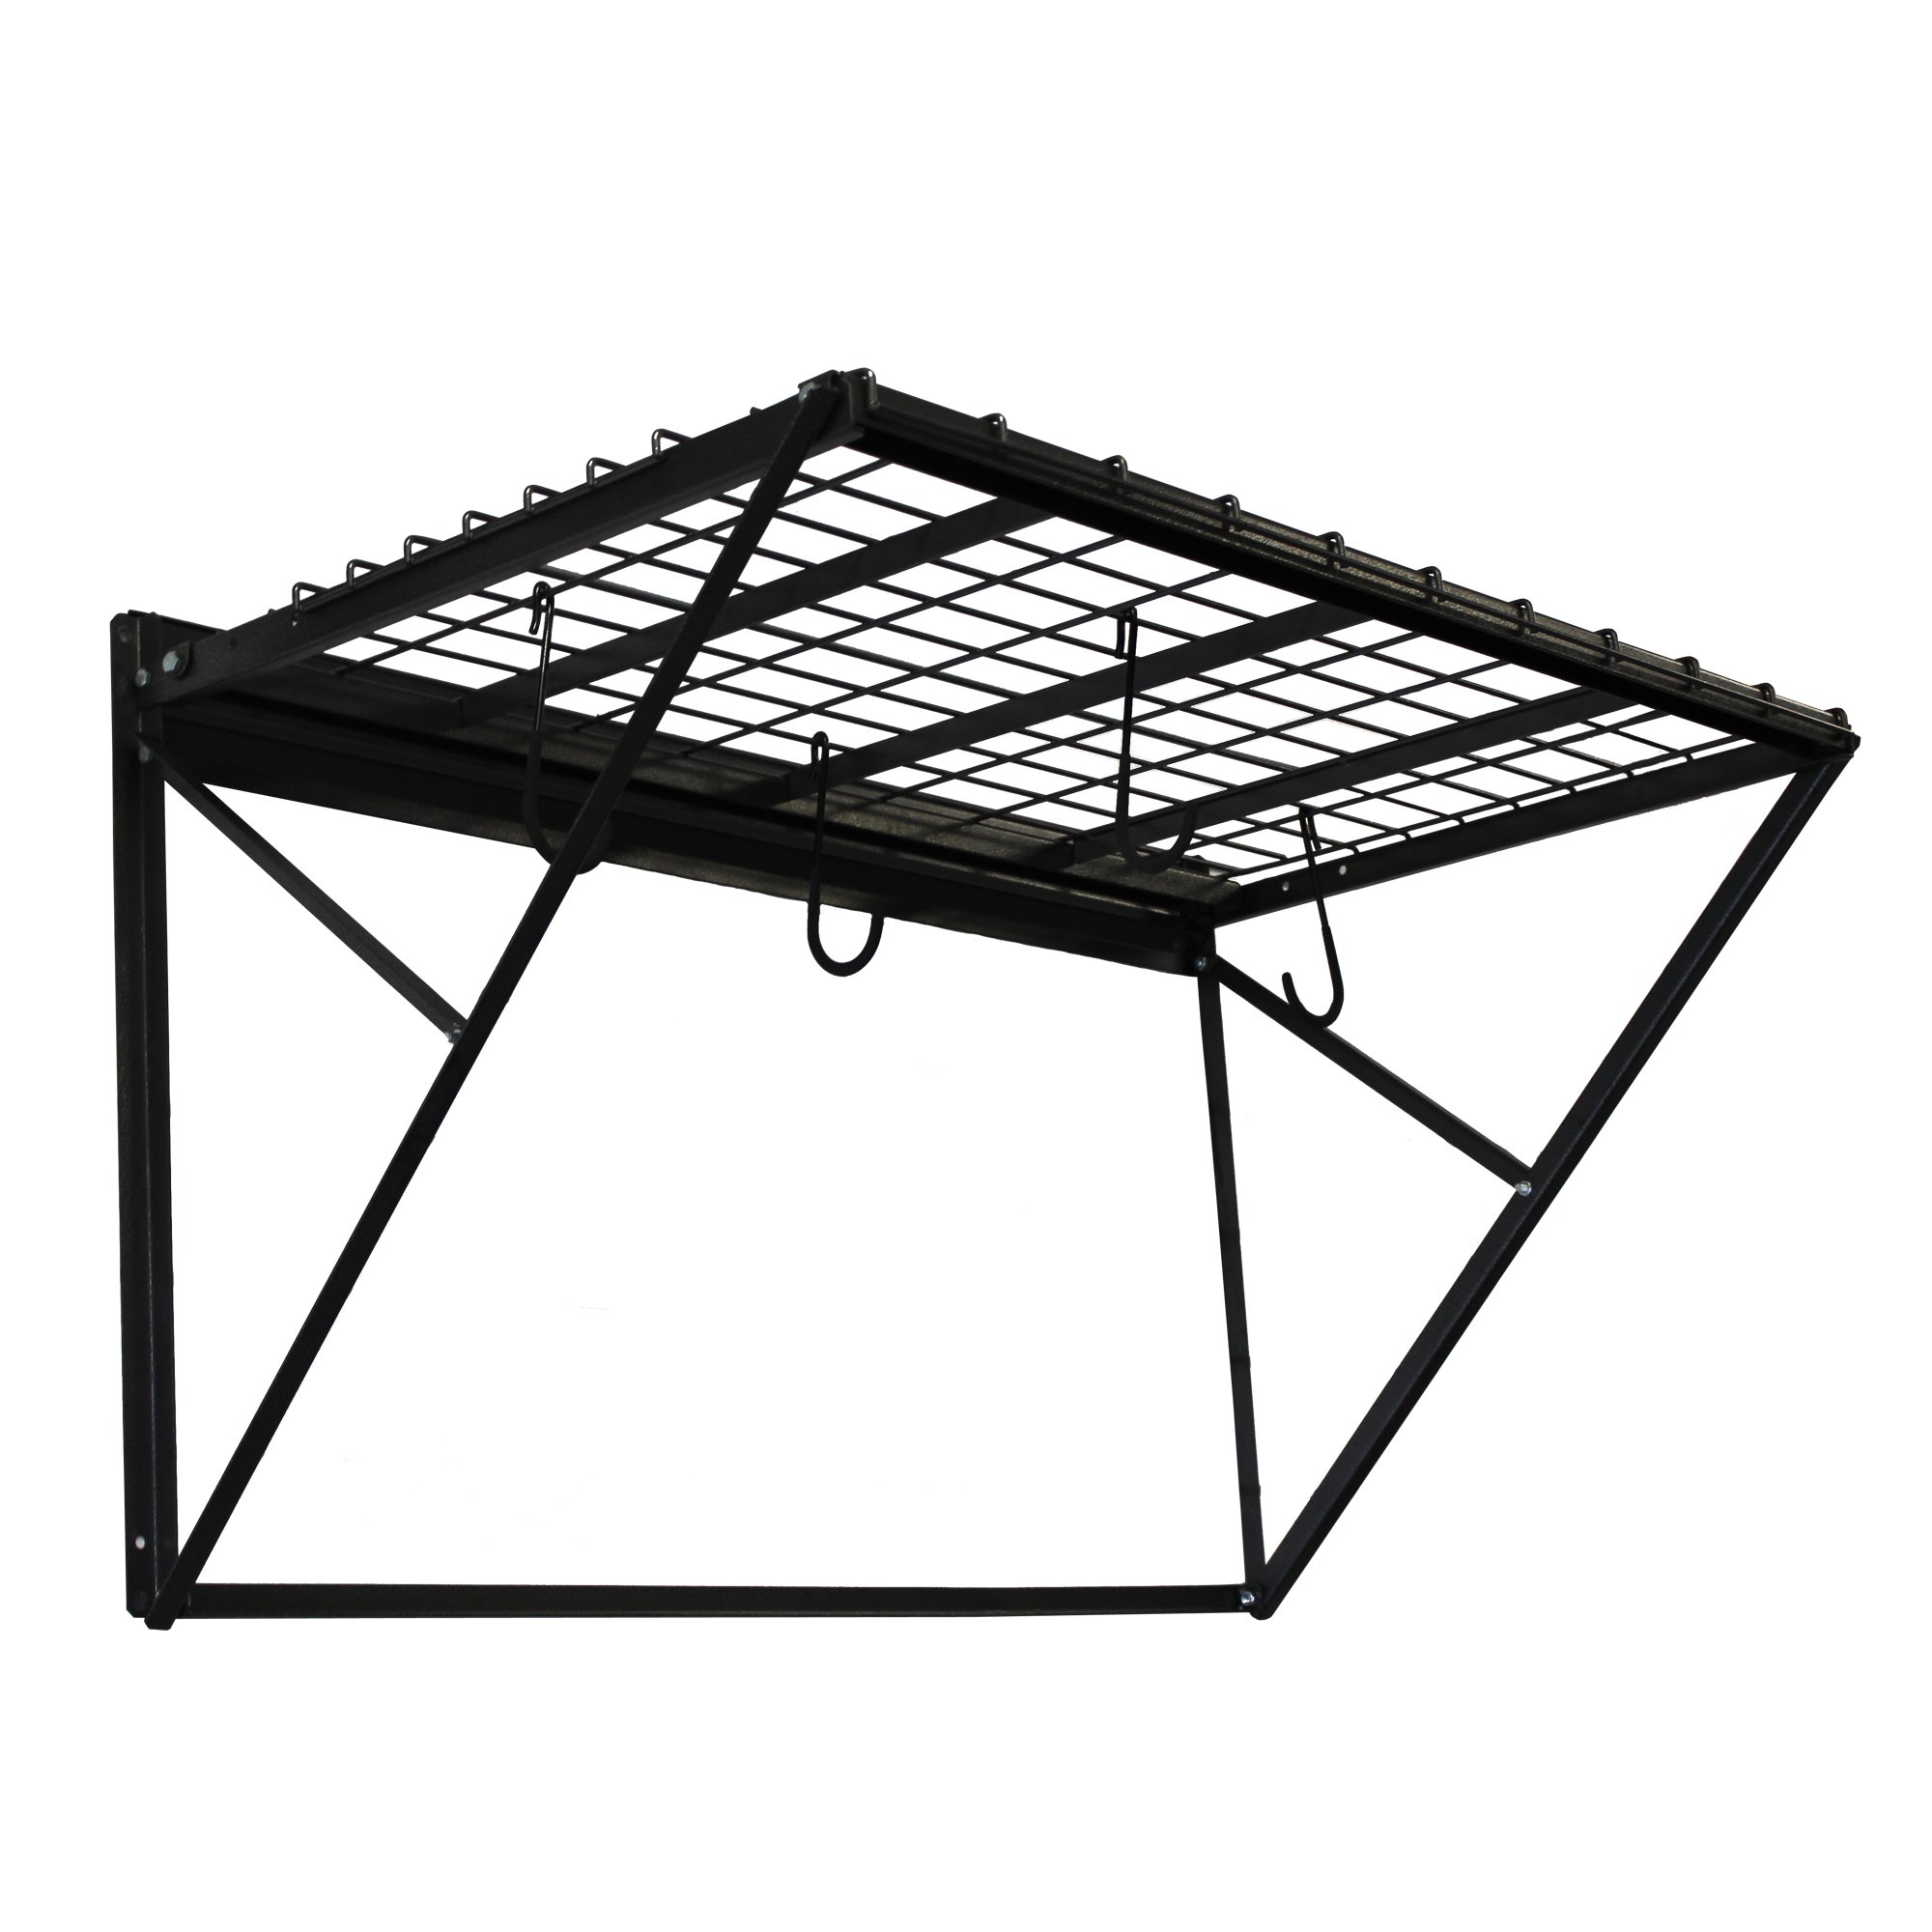 Proslat 60001 ProRack Heavy Duty Wall Mount Metal Storage Shelf with 4' Section, Charcoal Granite